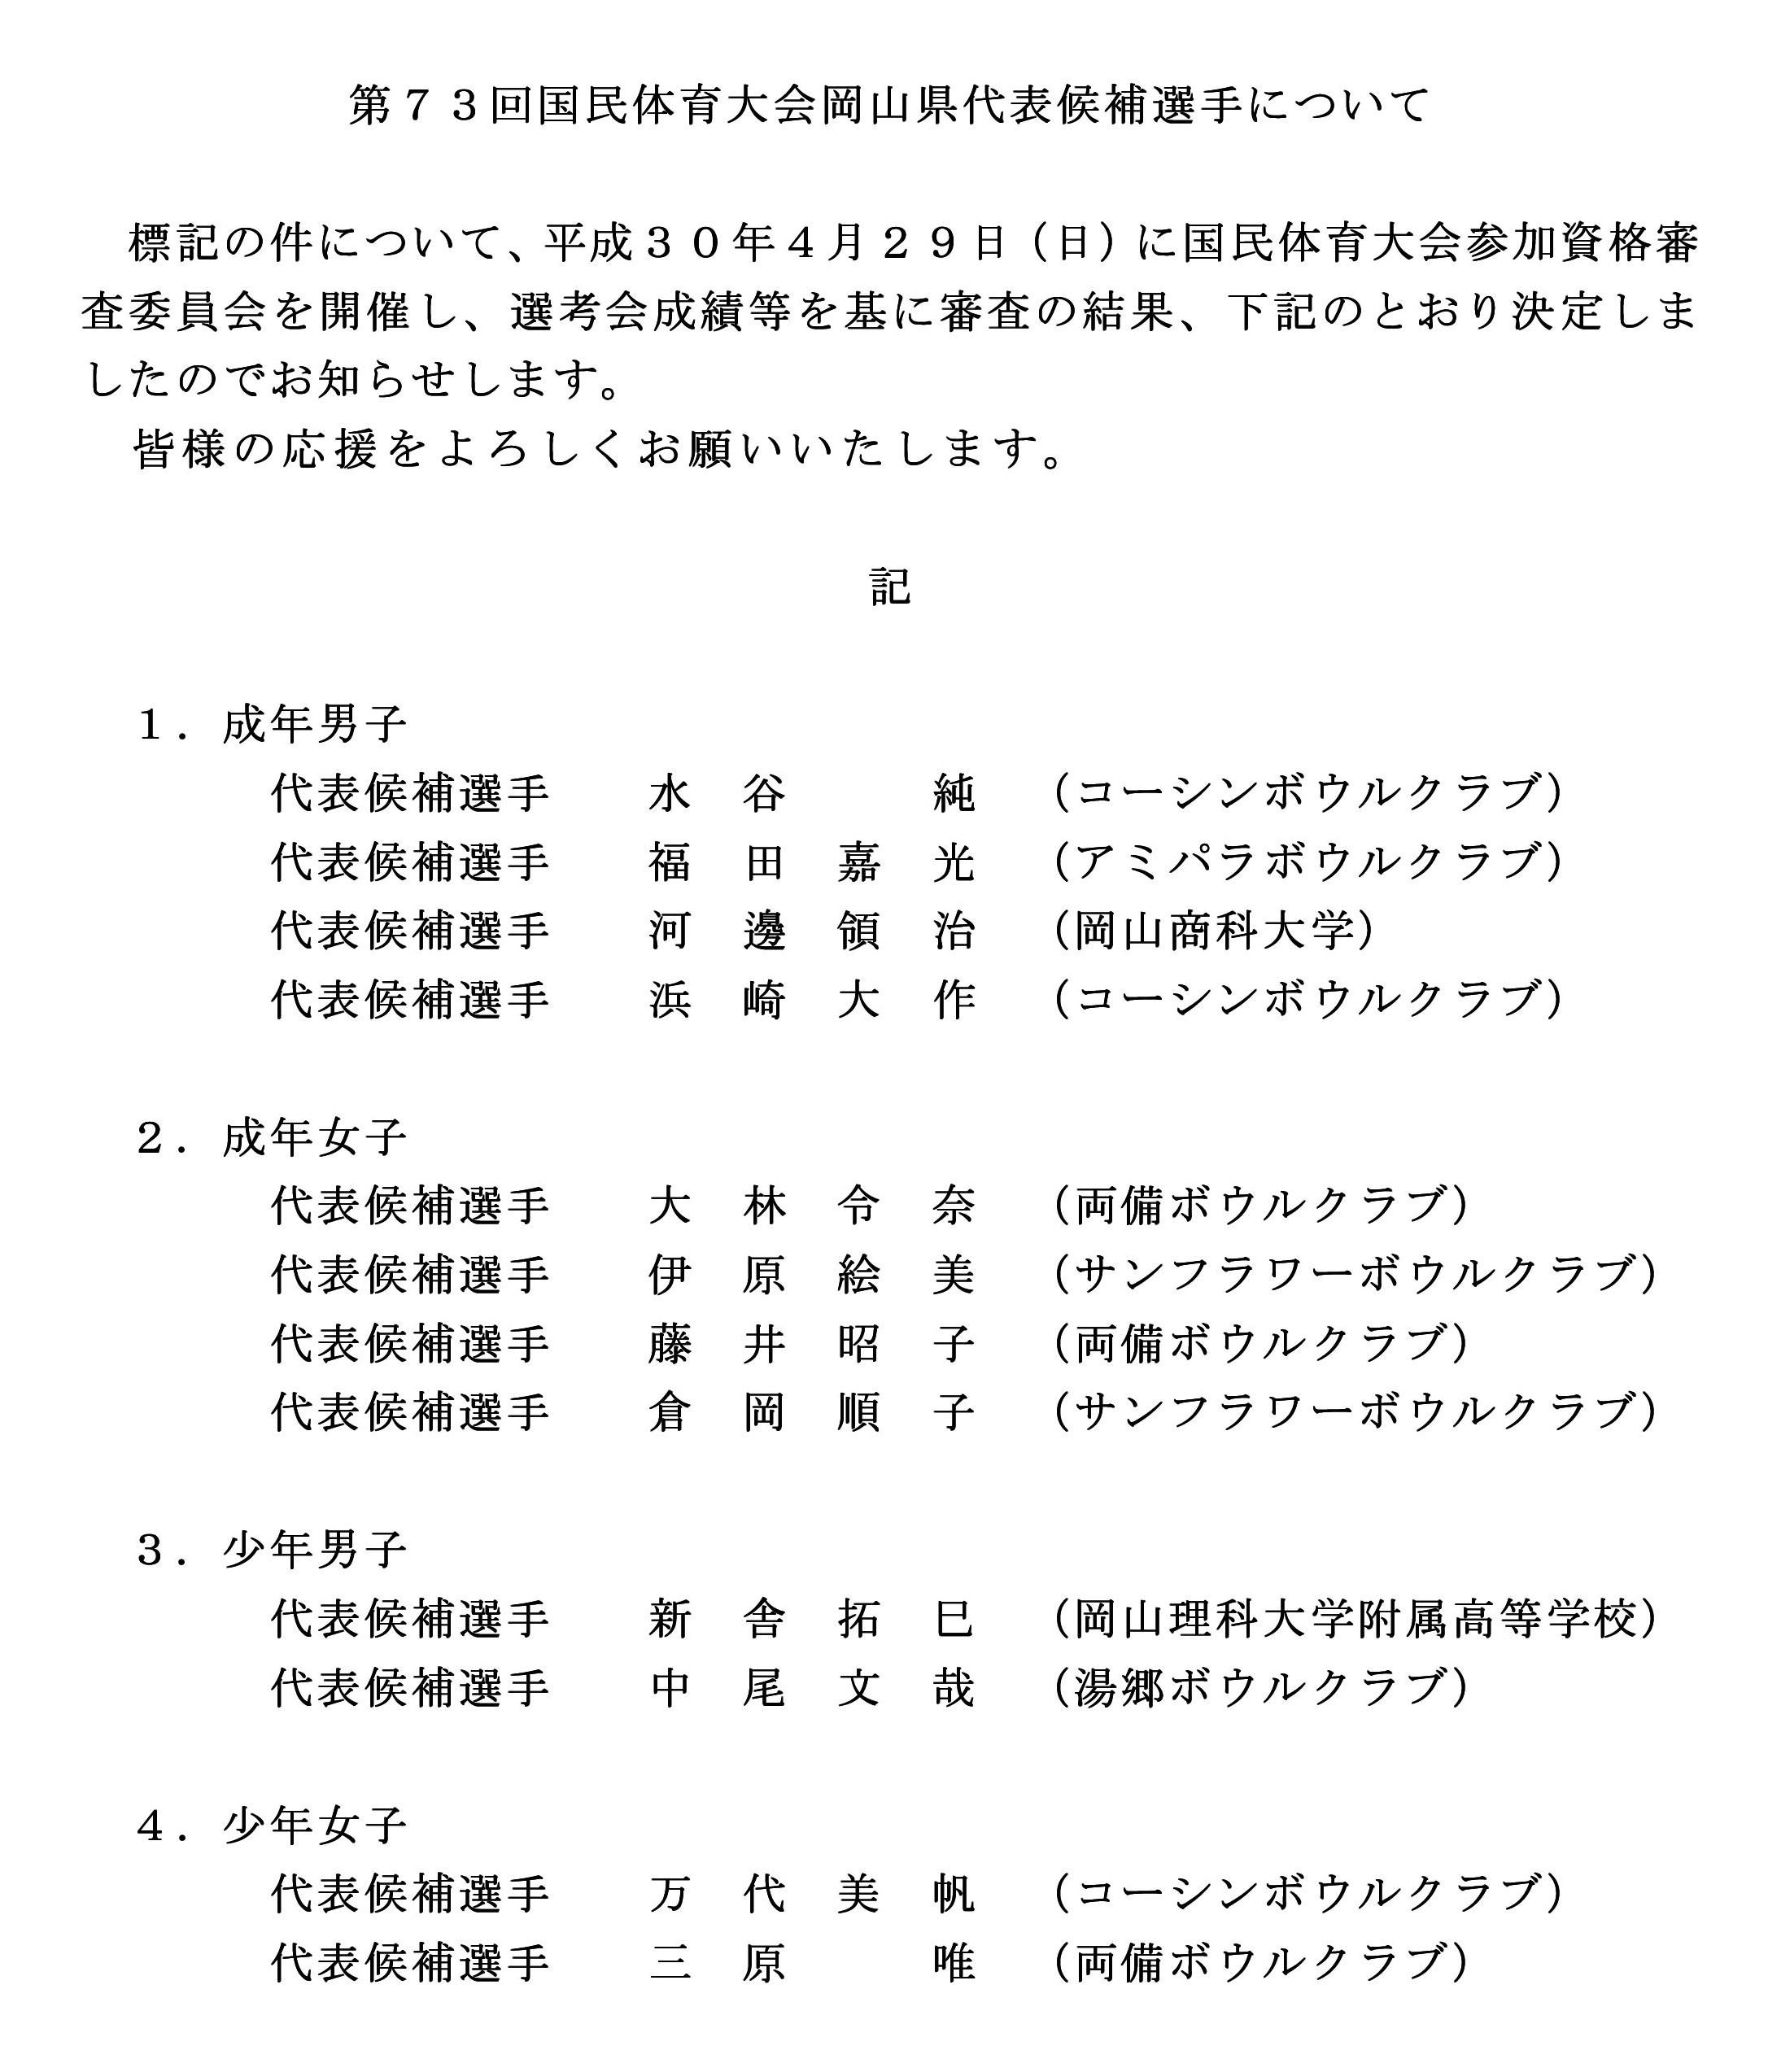 Microsoft Word - 第73回国民体育大会岡山県代表候補選手について.jpg